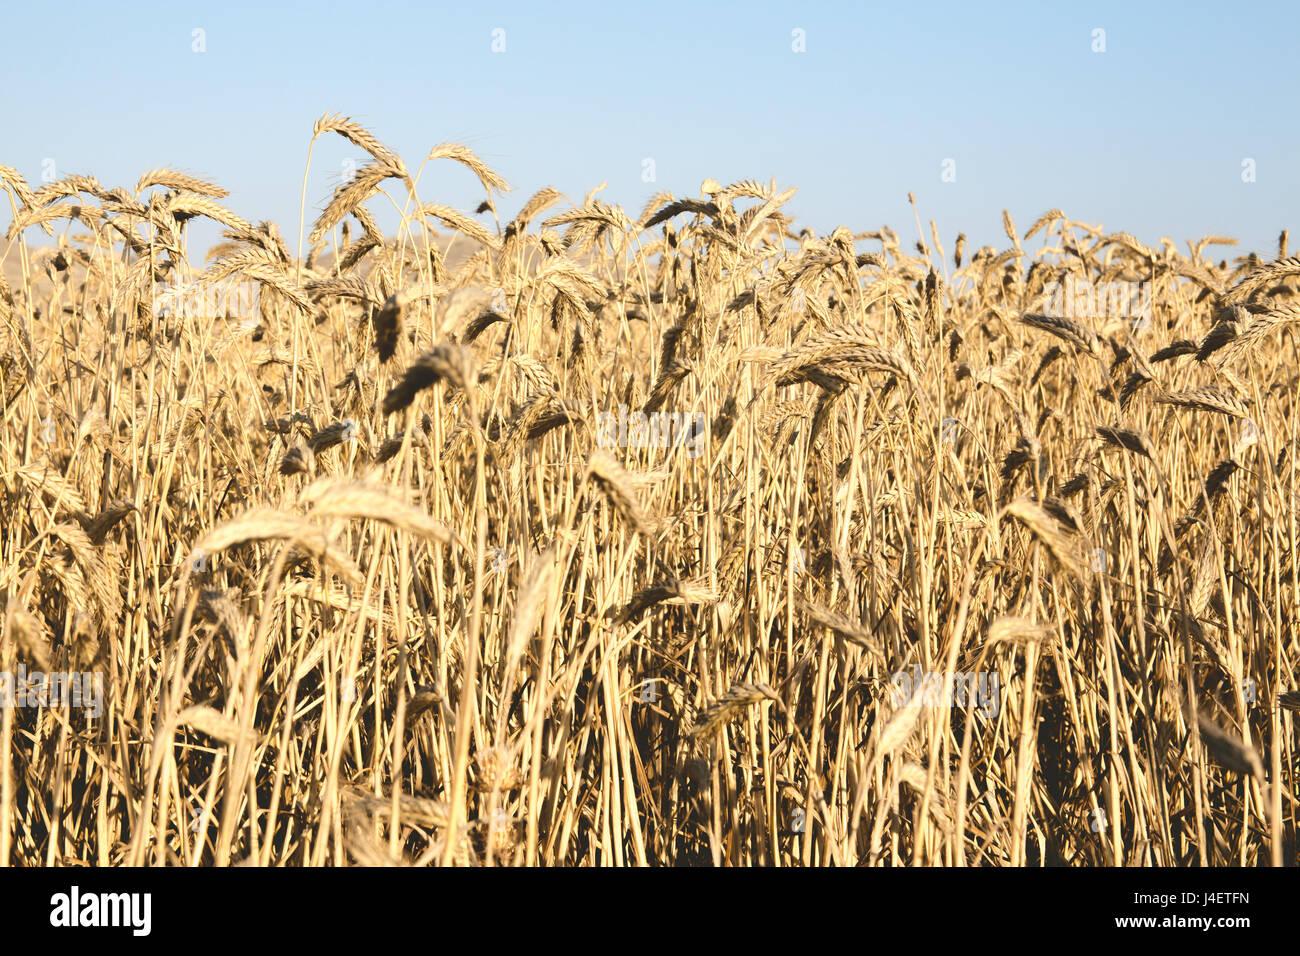 Fields of wheat on a sunny day, landscape orientation. - Stock Image